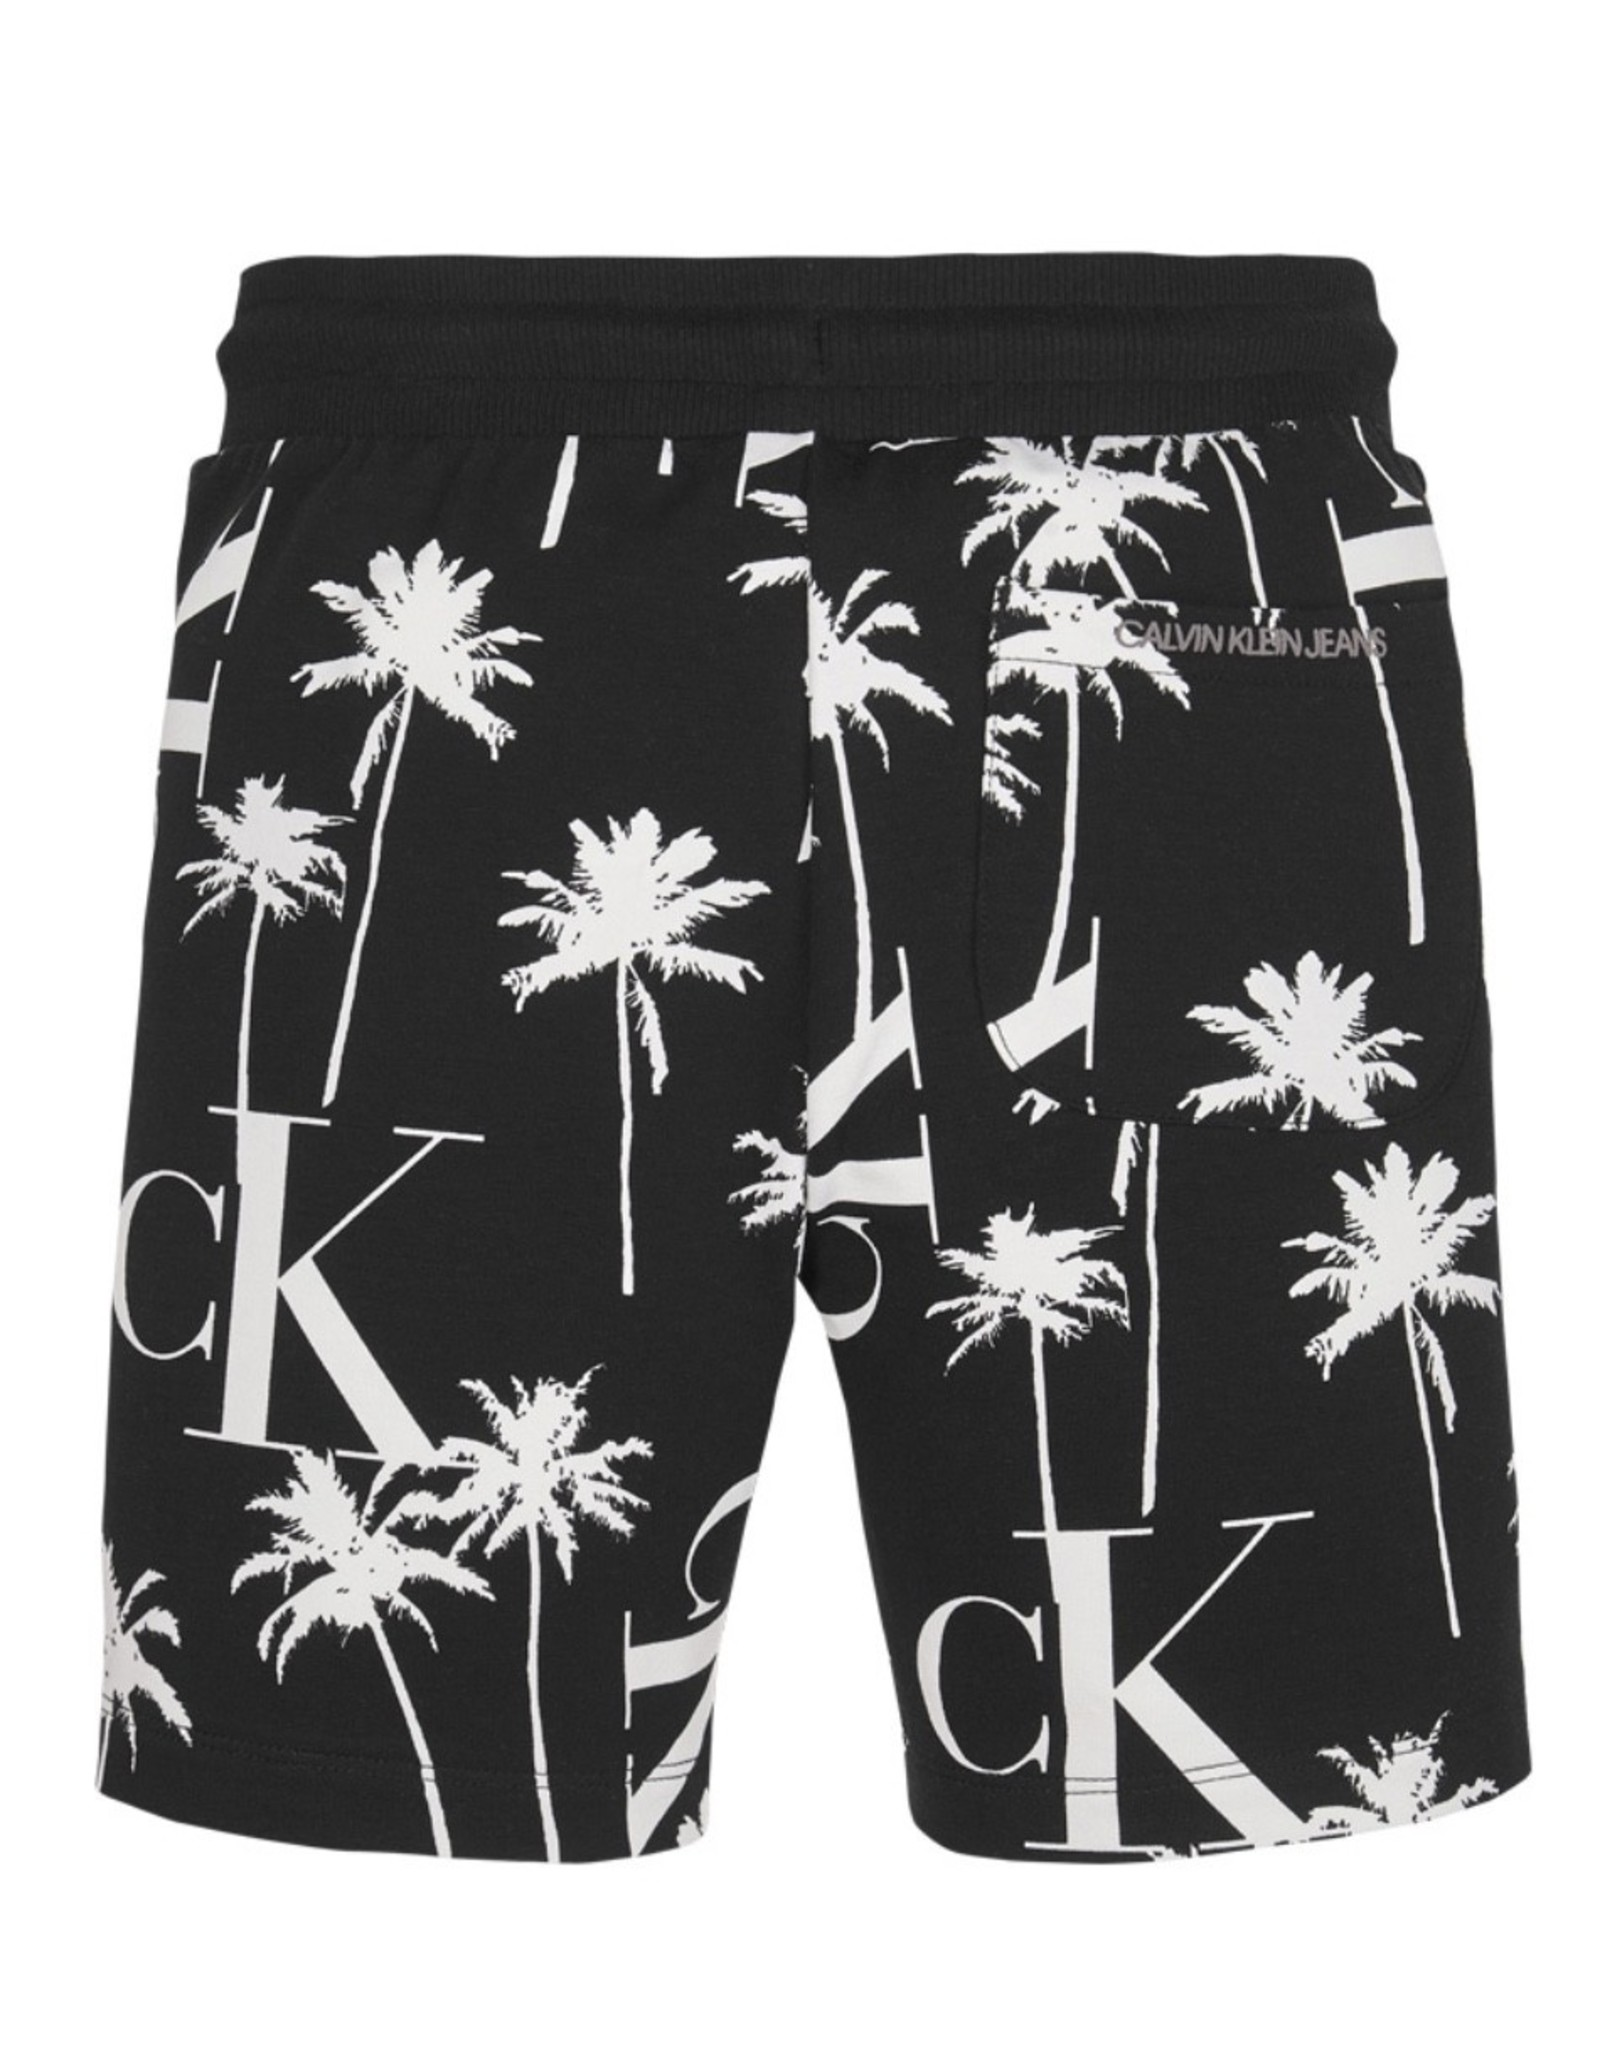 Calvin Klein 00444  short